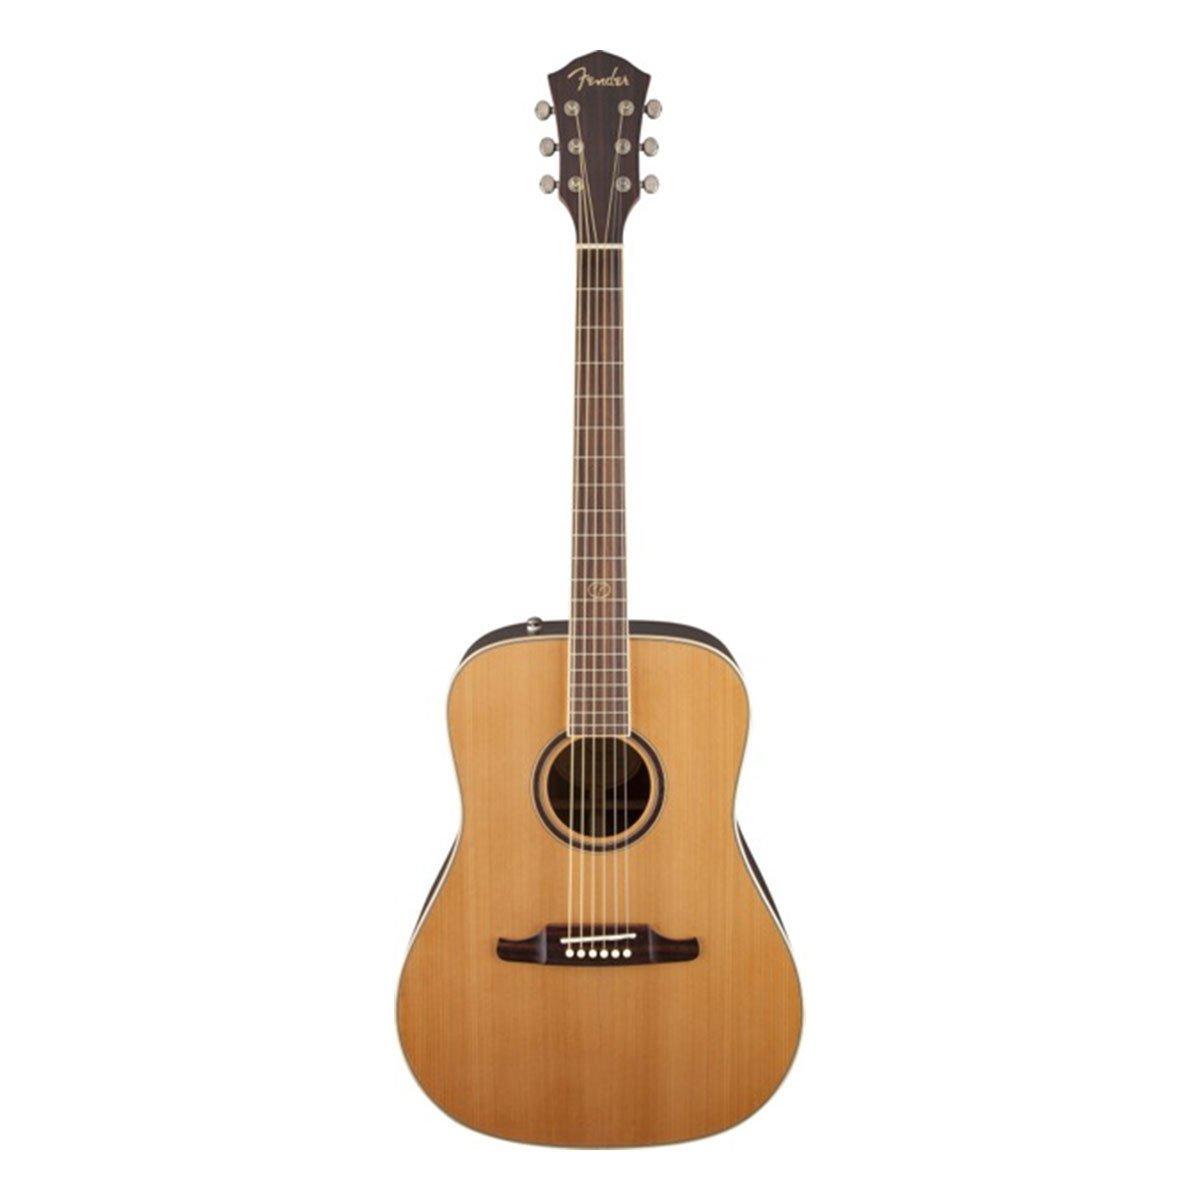 Fender - F1030 Naturel